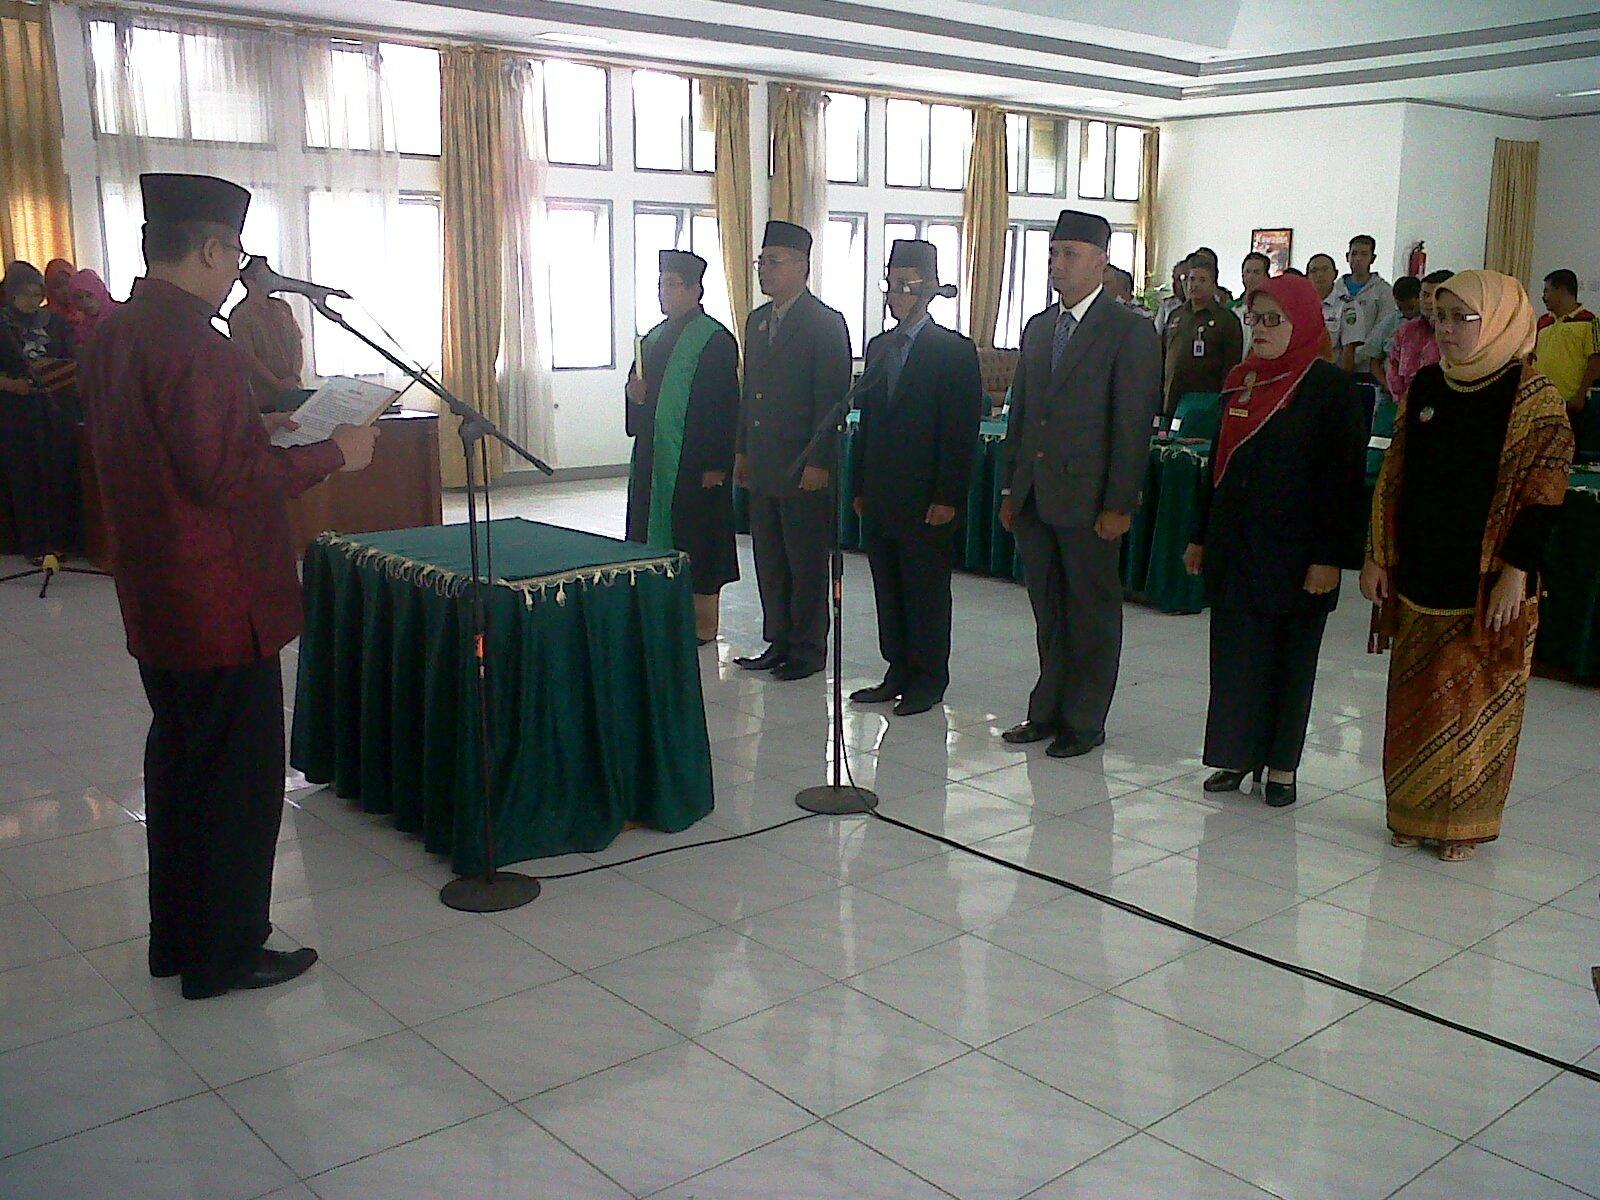 Wako Hendri Arnis melantik pejabat Eselon II dilantik untuk mengisi kekosongan jabatan pada lima SKPD di lingkungan Pemko setempat.